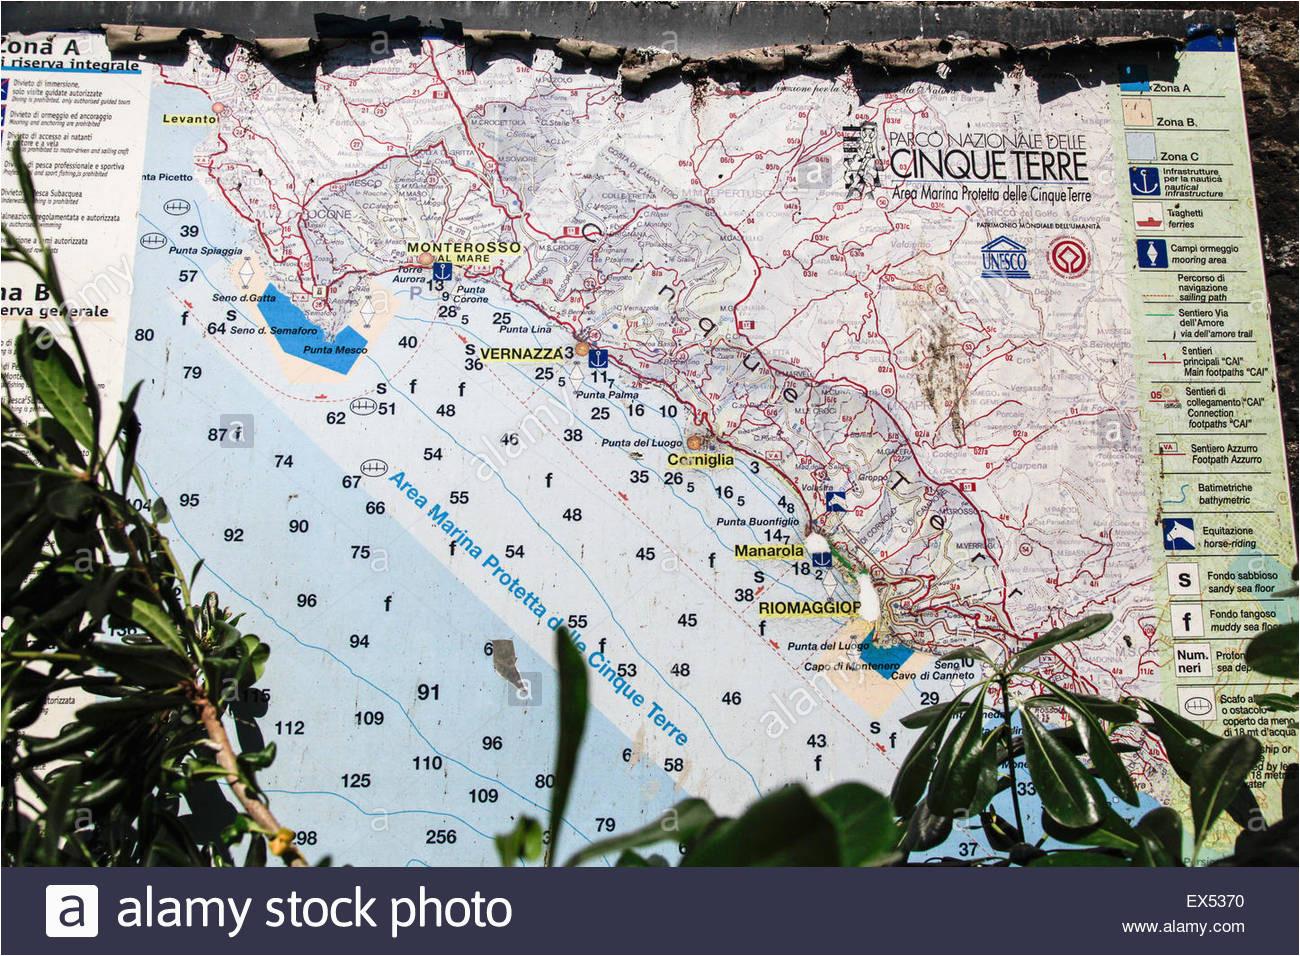 italian riviera map stockfotos italian riviera map bilder alamy